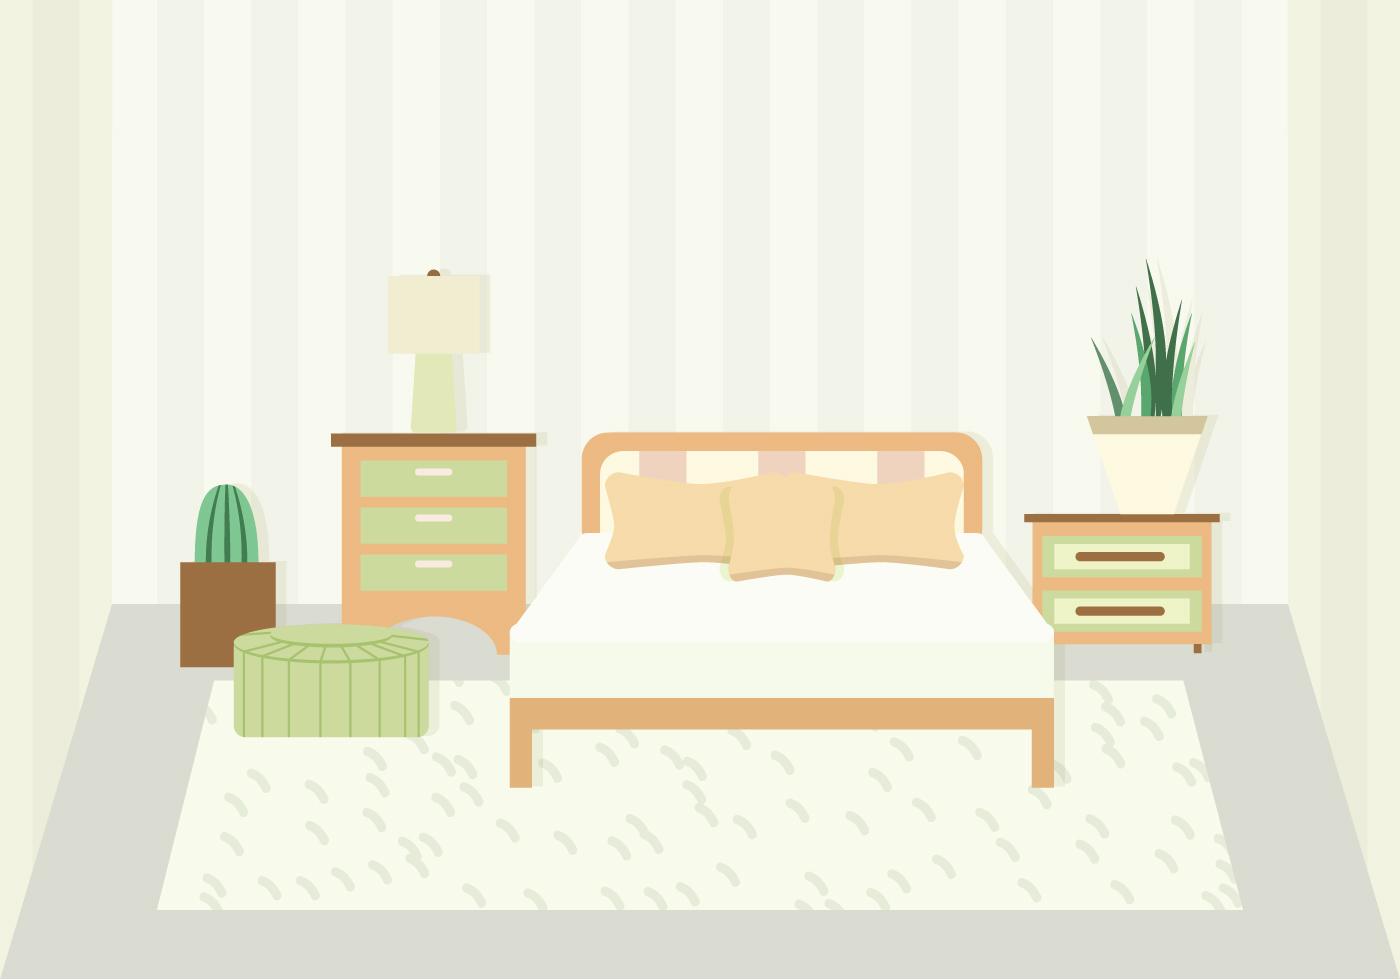 bedroom vector illustration 150736 vector art at vecteezy